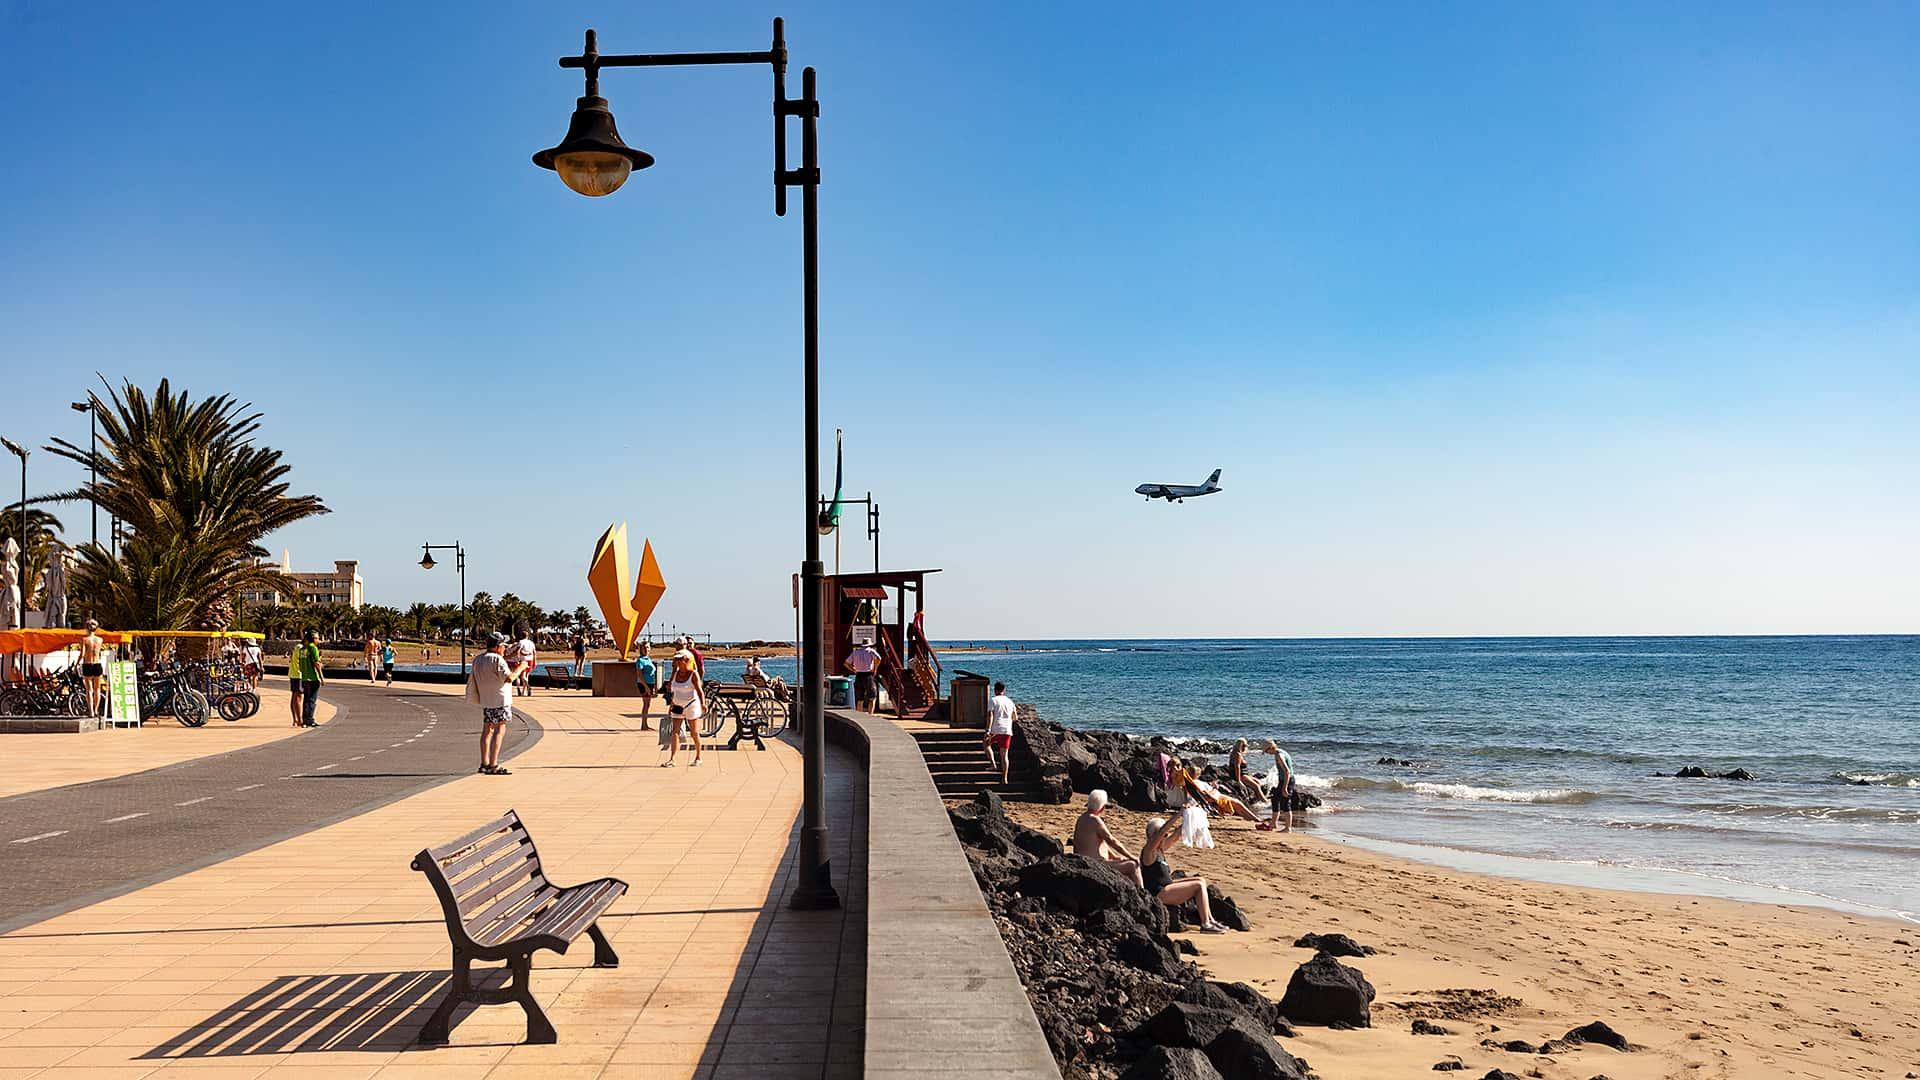 Playa Matagorda